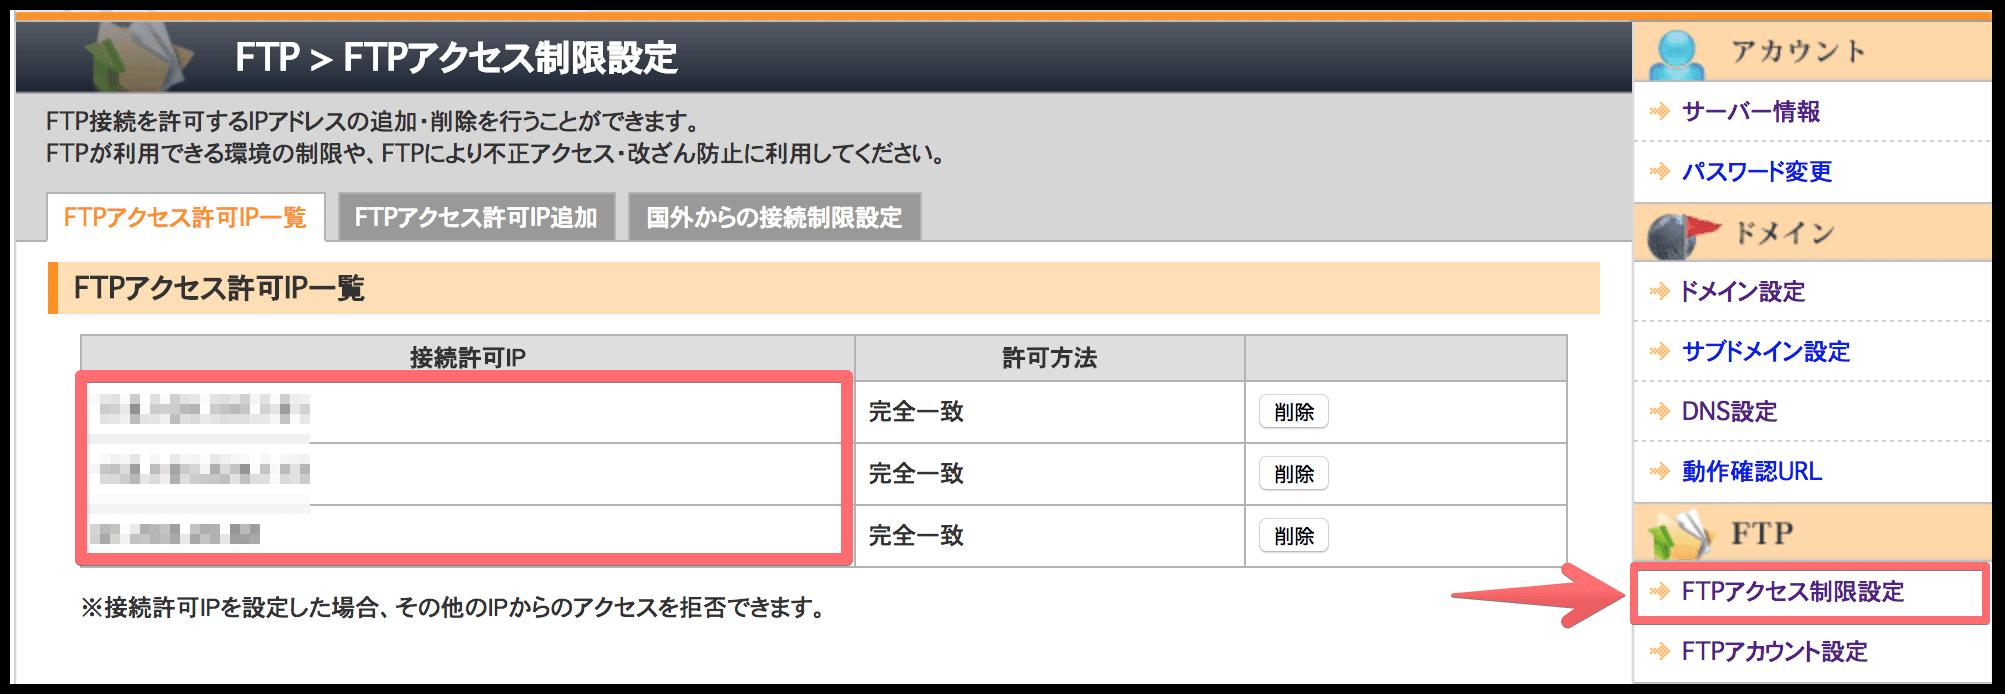 FTPアクセス制限設定